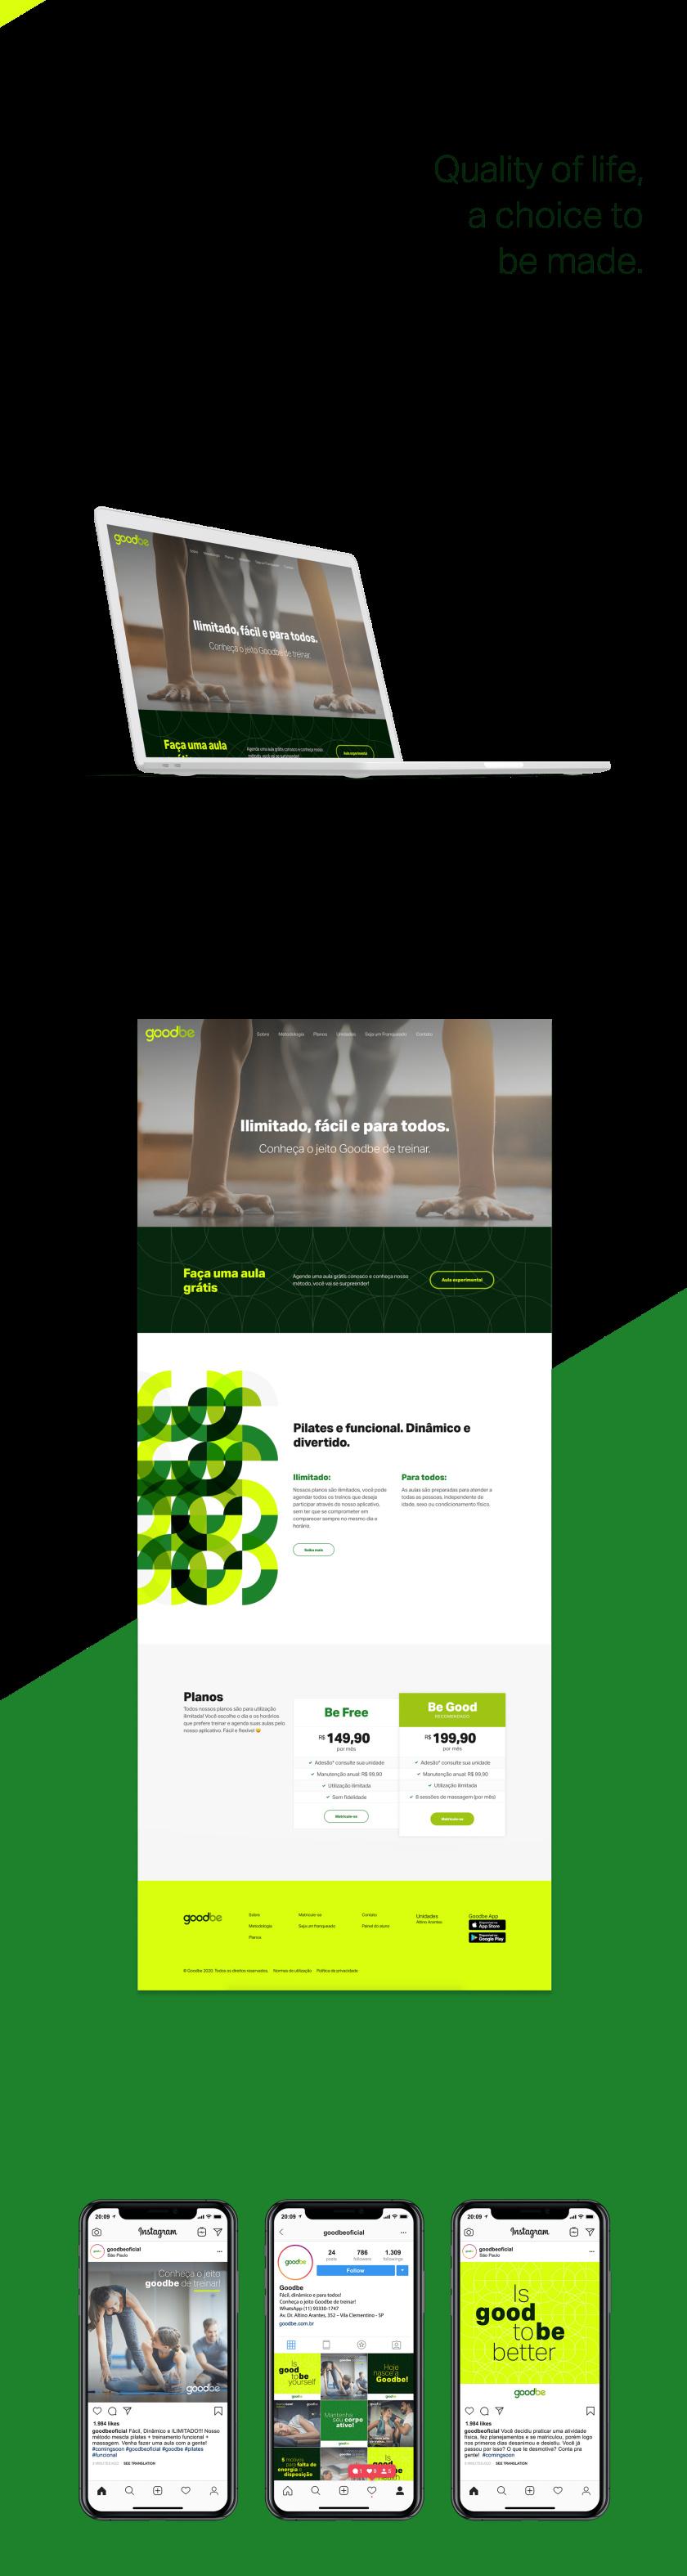 Goodbe健身中心品牌vi形象设计,一个积极活力和动态绿色的链接形象